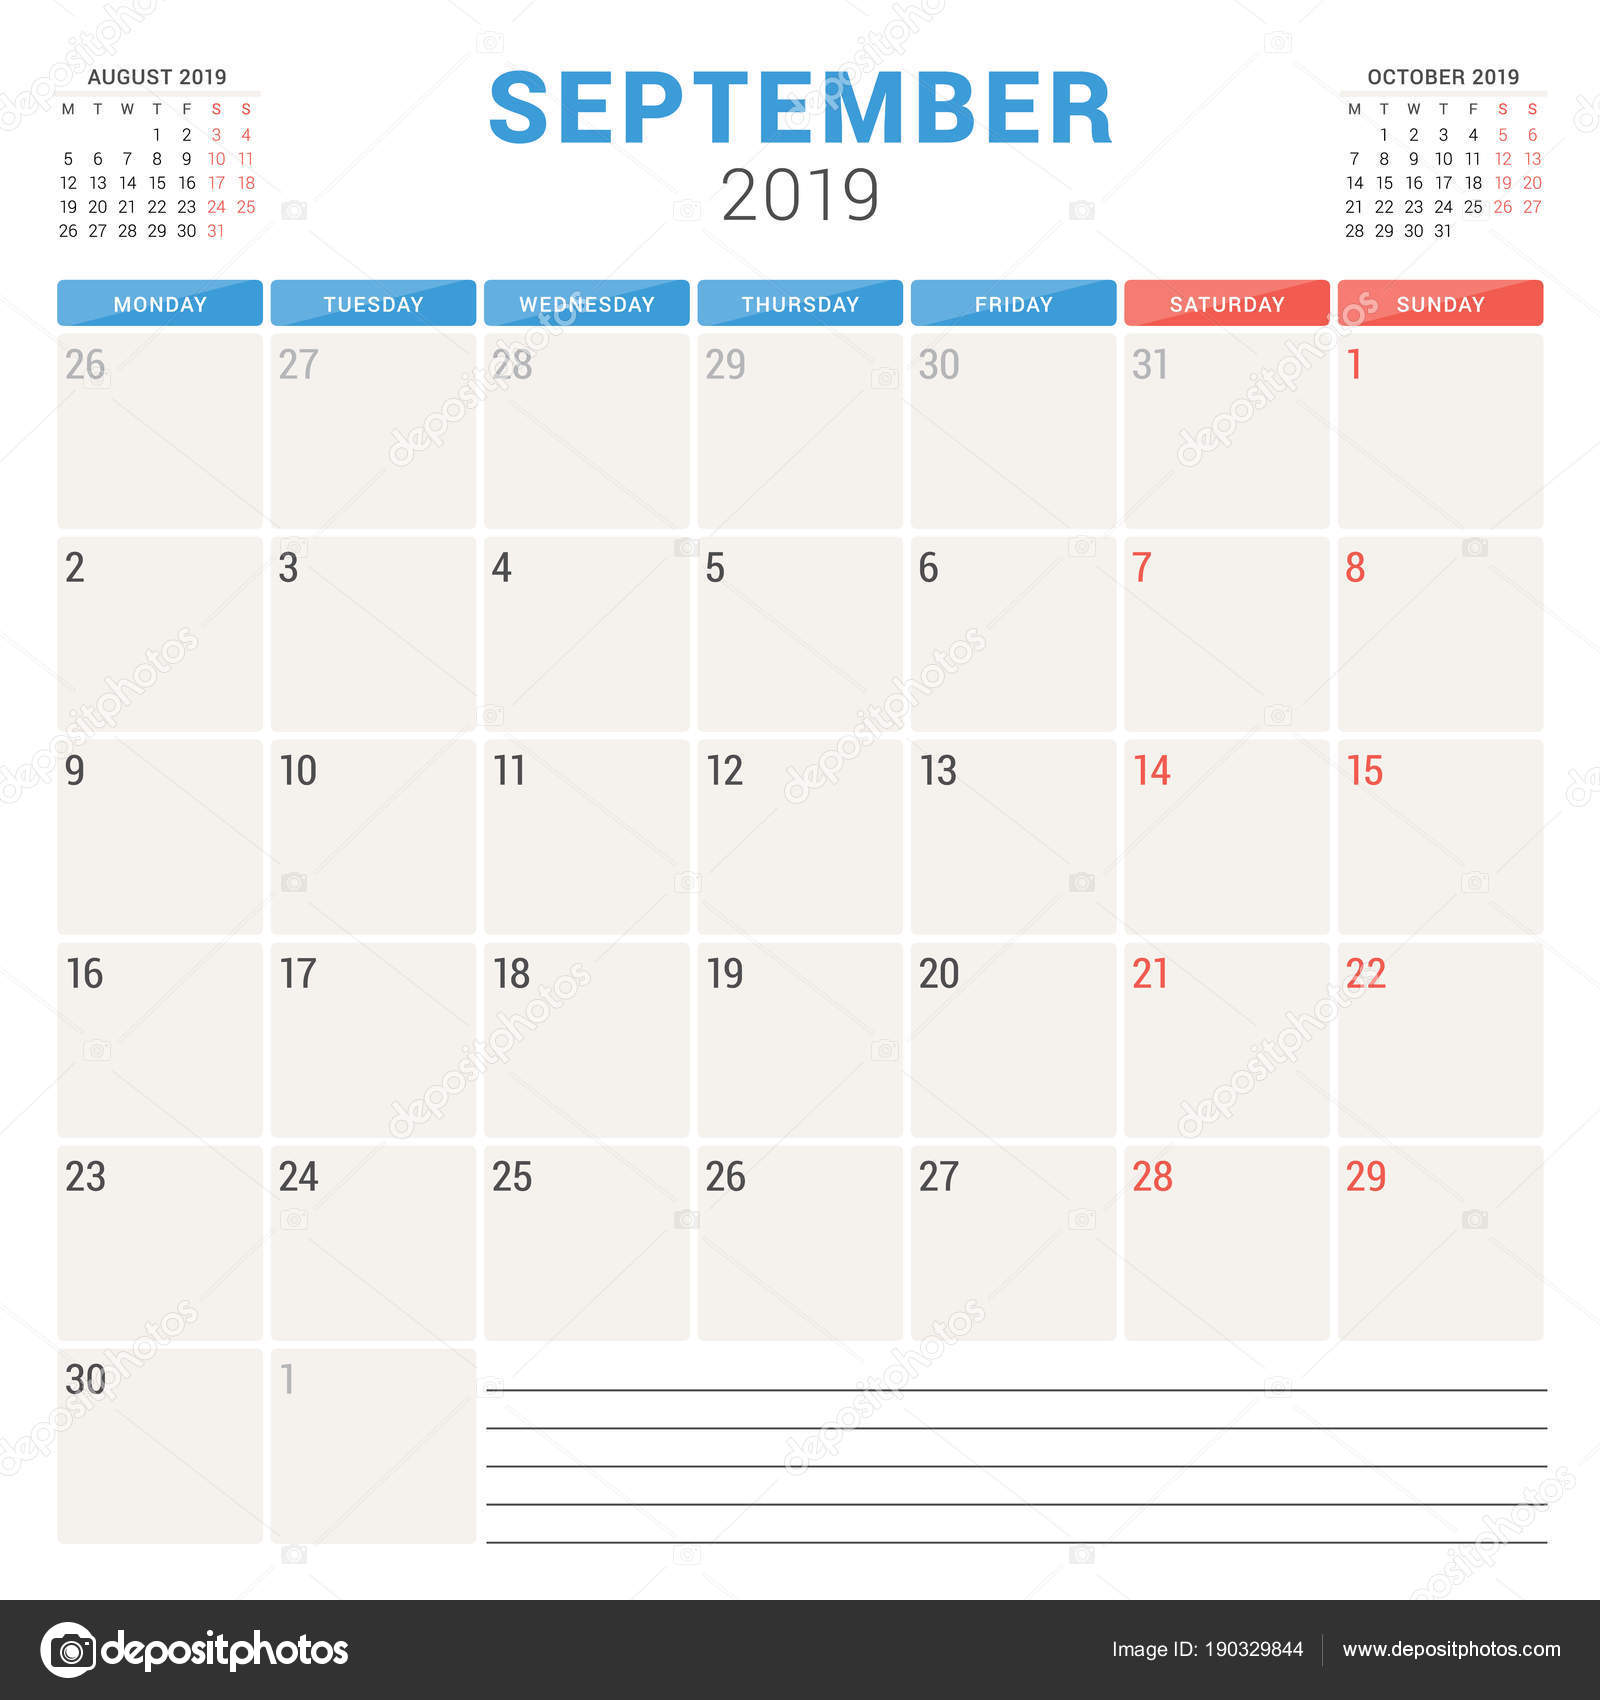 Template Calendrier 2019.Calendar Planner For September 2019 Week Starts On Monday